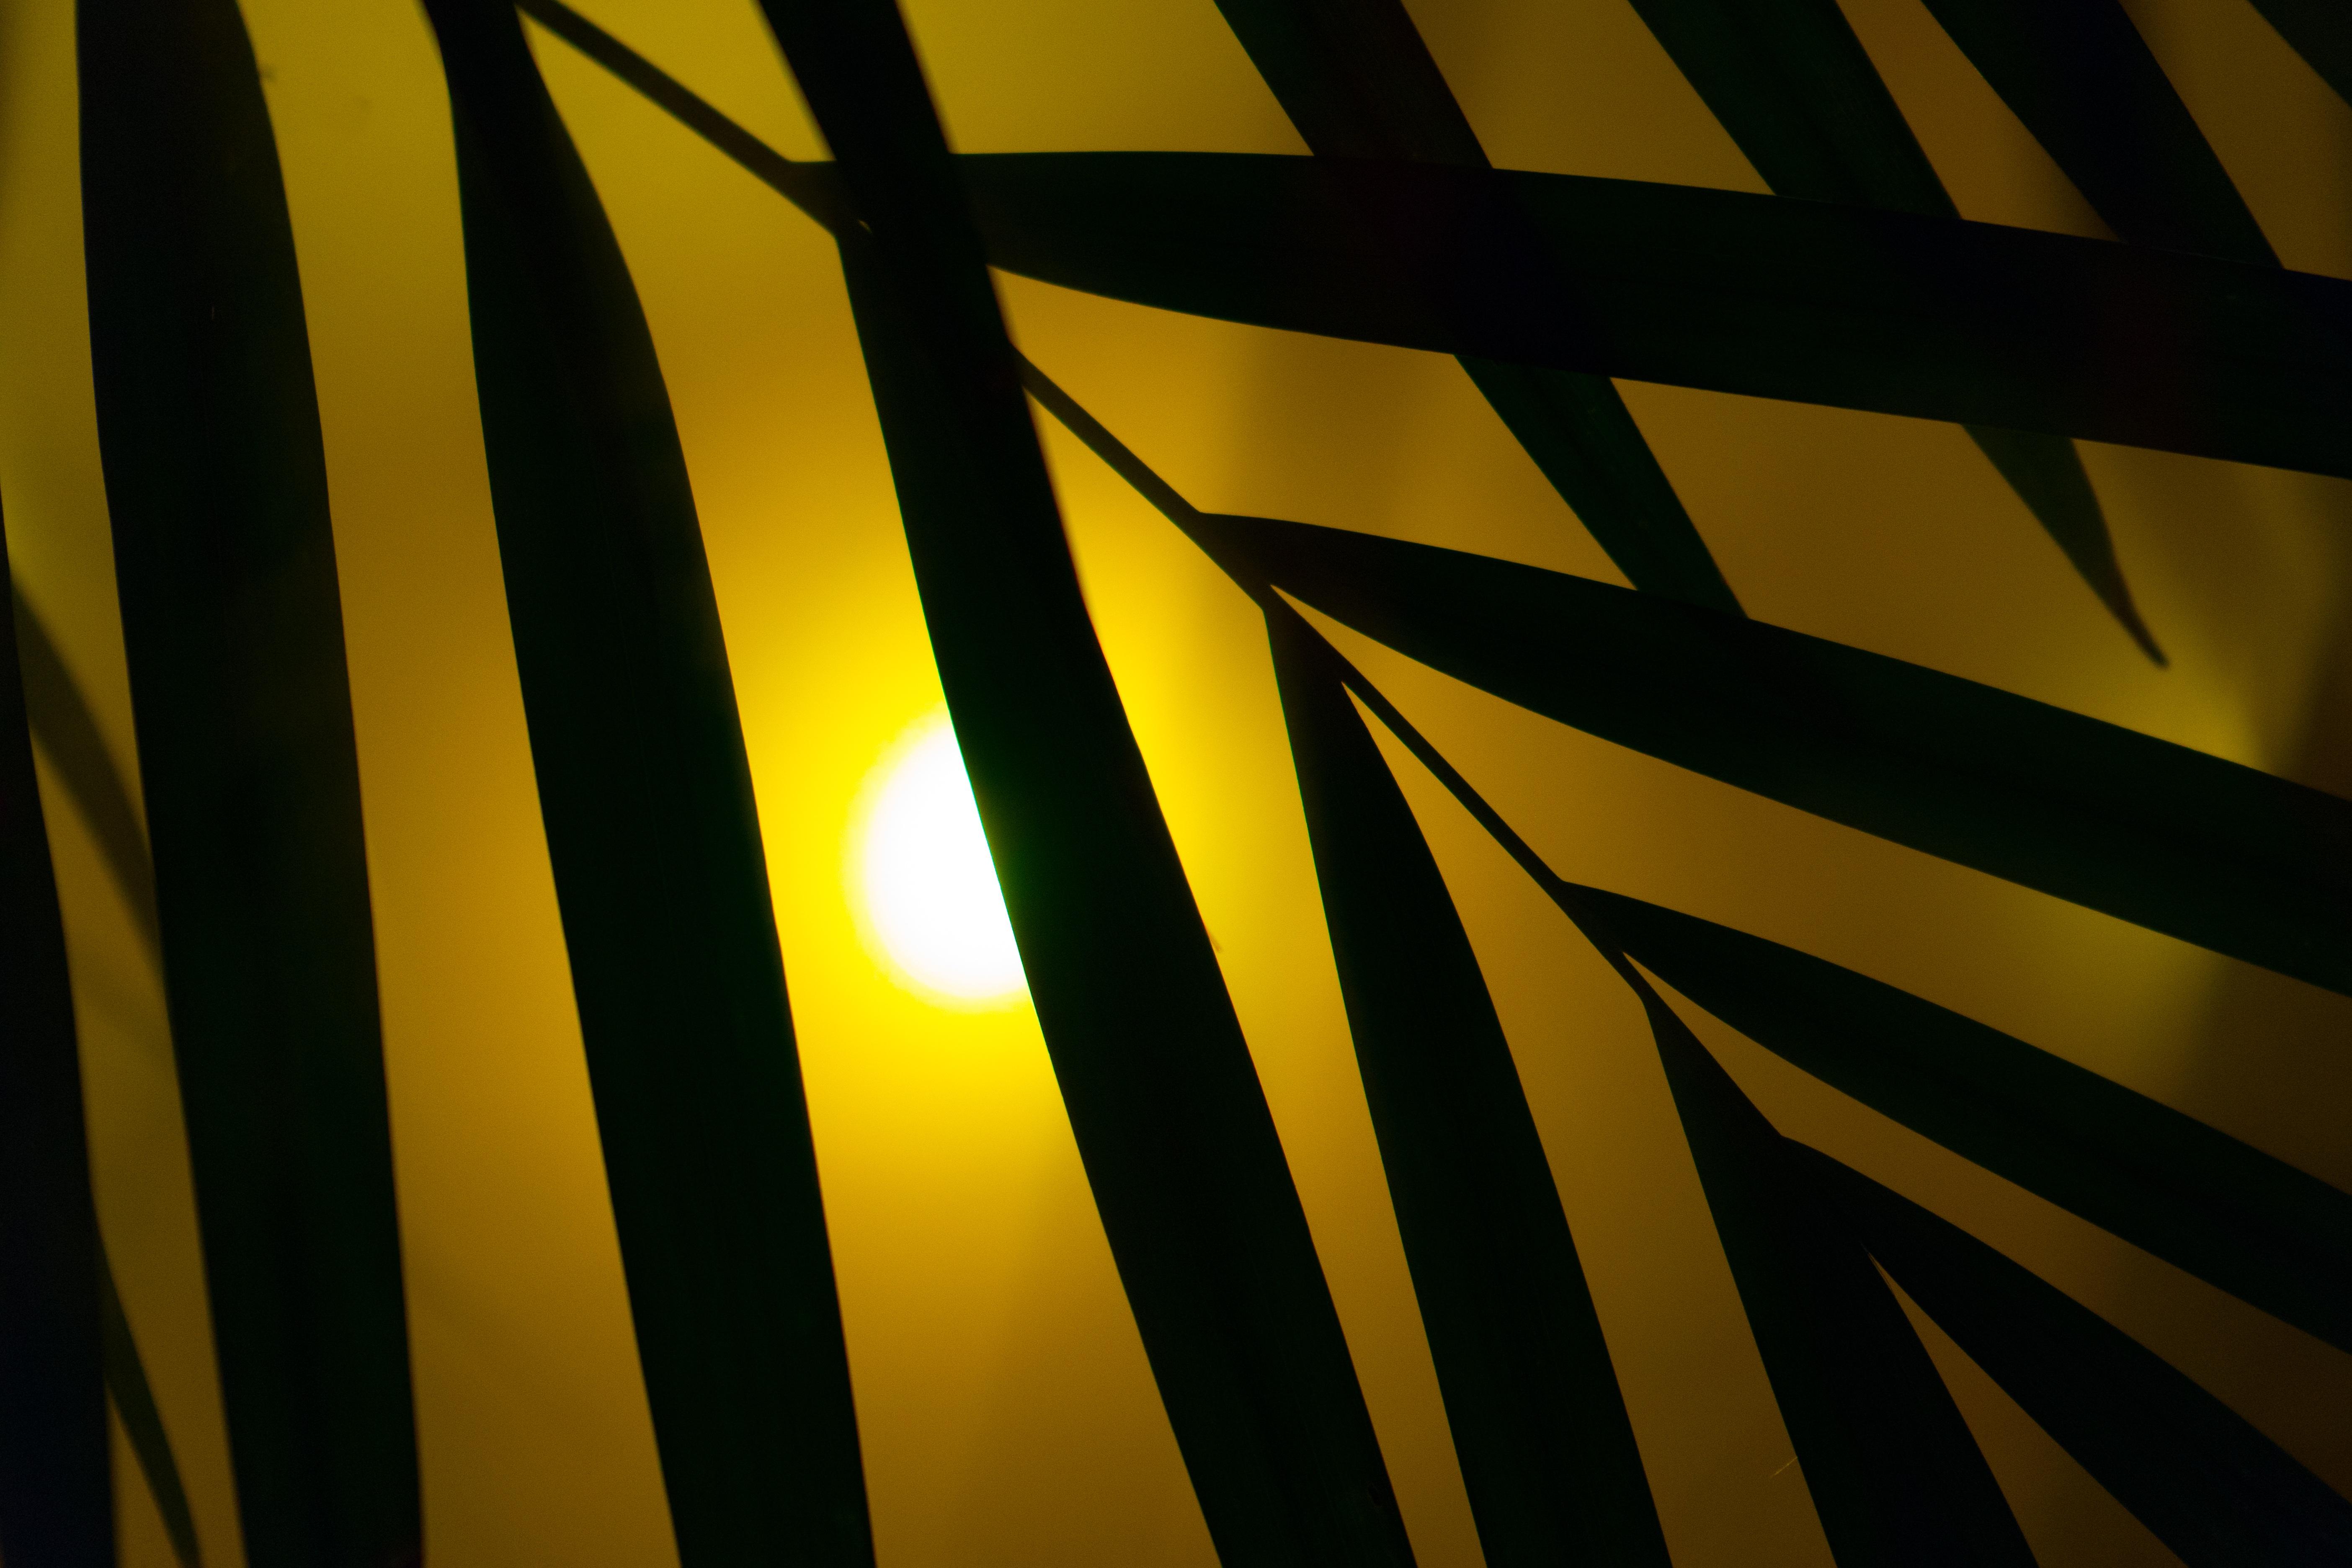 light fog sunlight leaf smoke summer line reflection palm color shadow lamp black colorful yellow lighting heat circle neon neon light art design party symmetry artificial shape diffuse neon lights computer wallpaper image series schemes neon lamps yukka 1407875